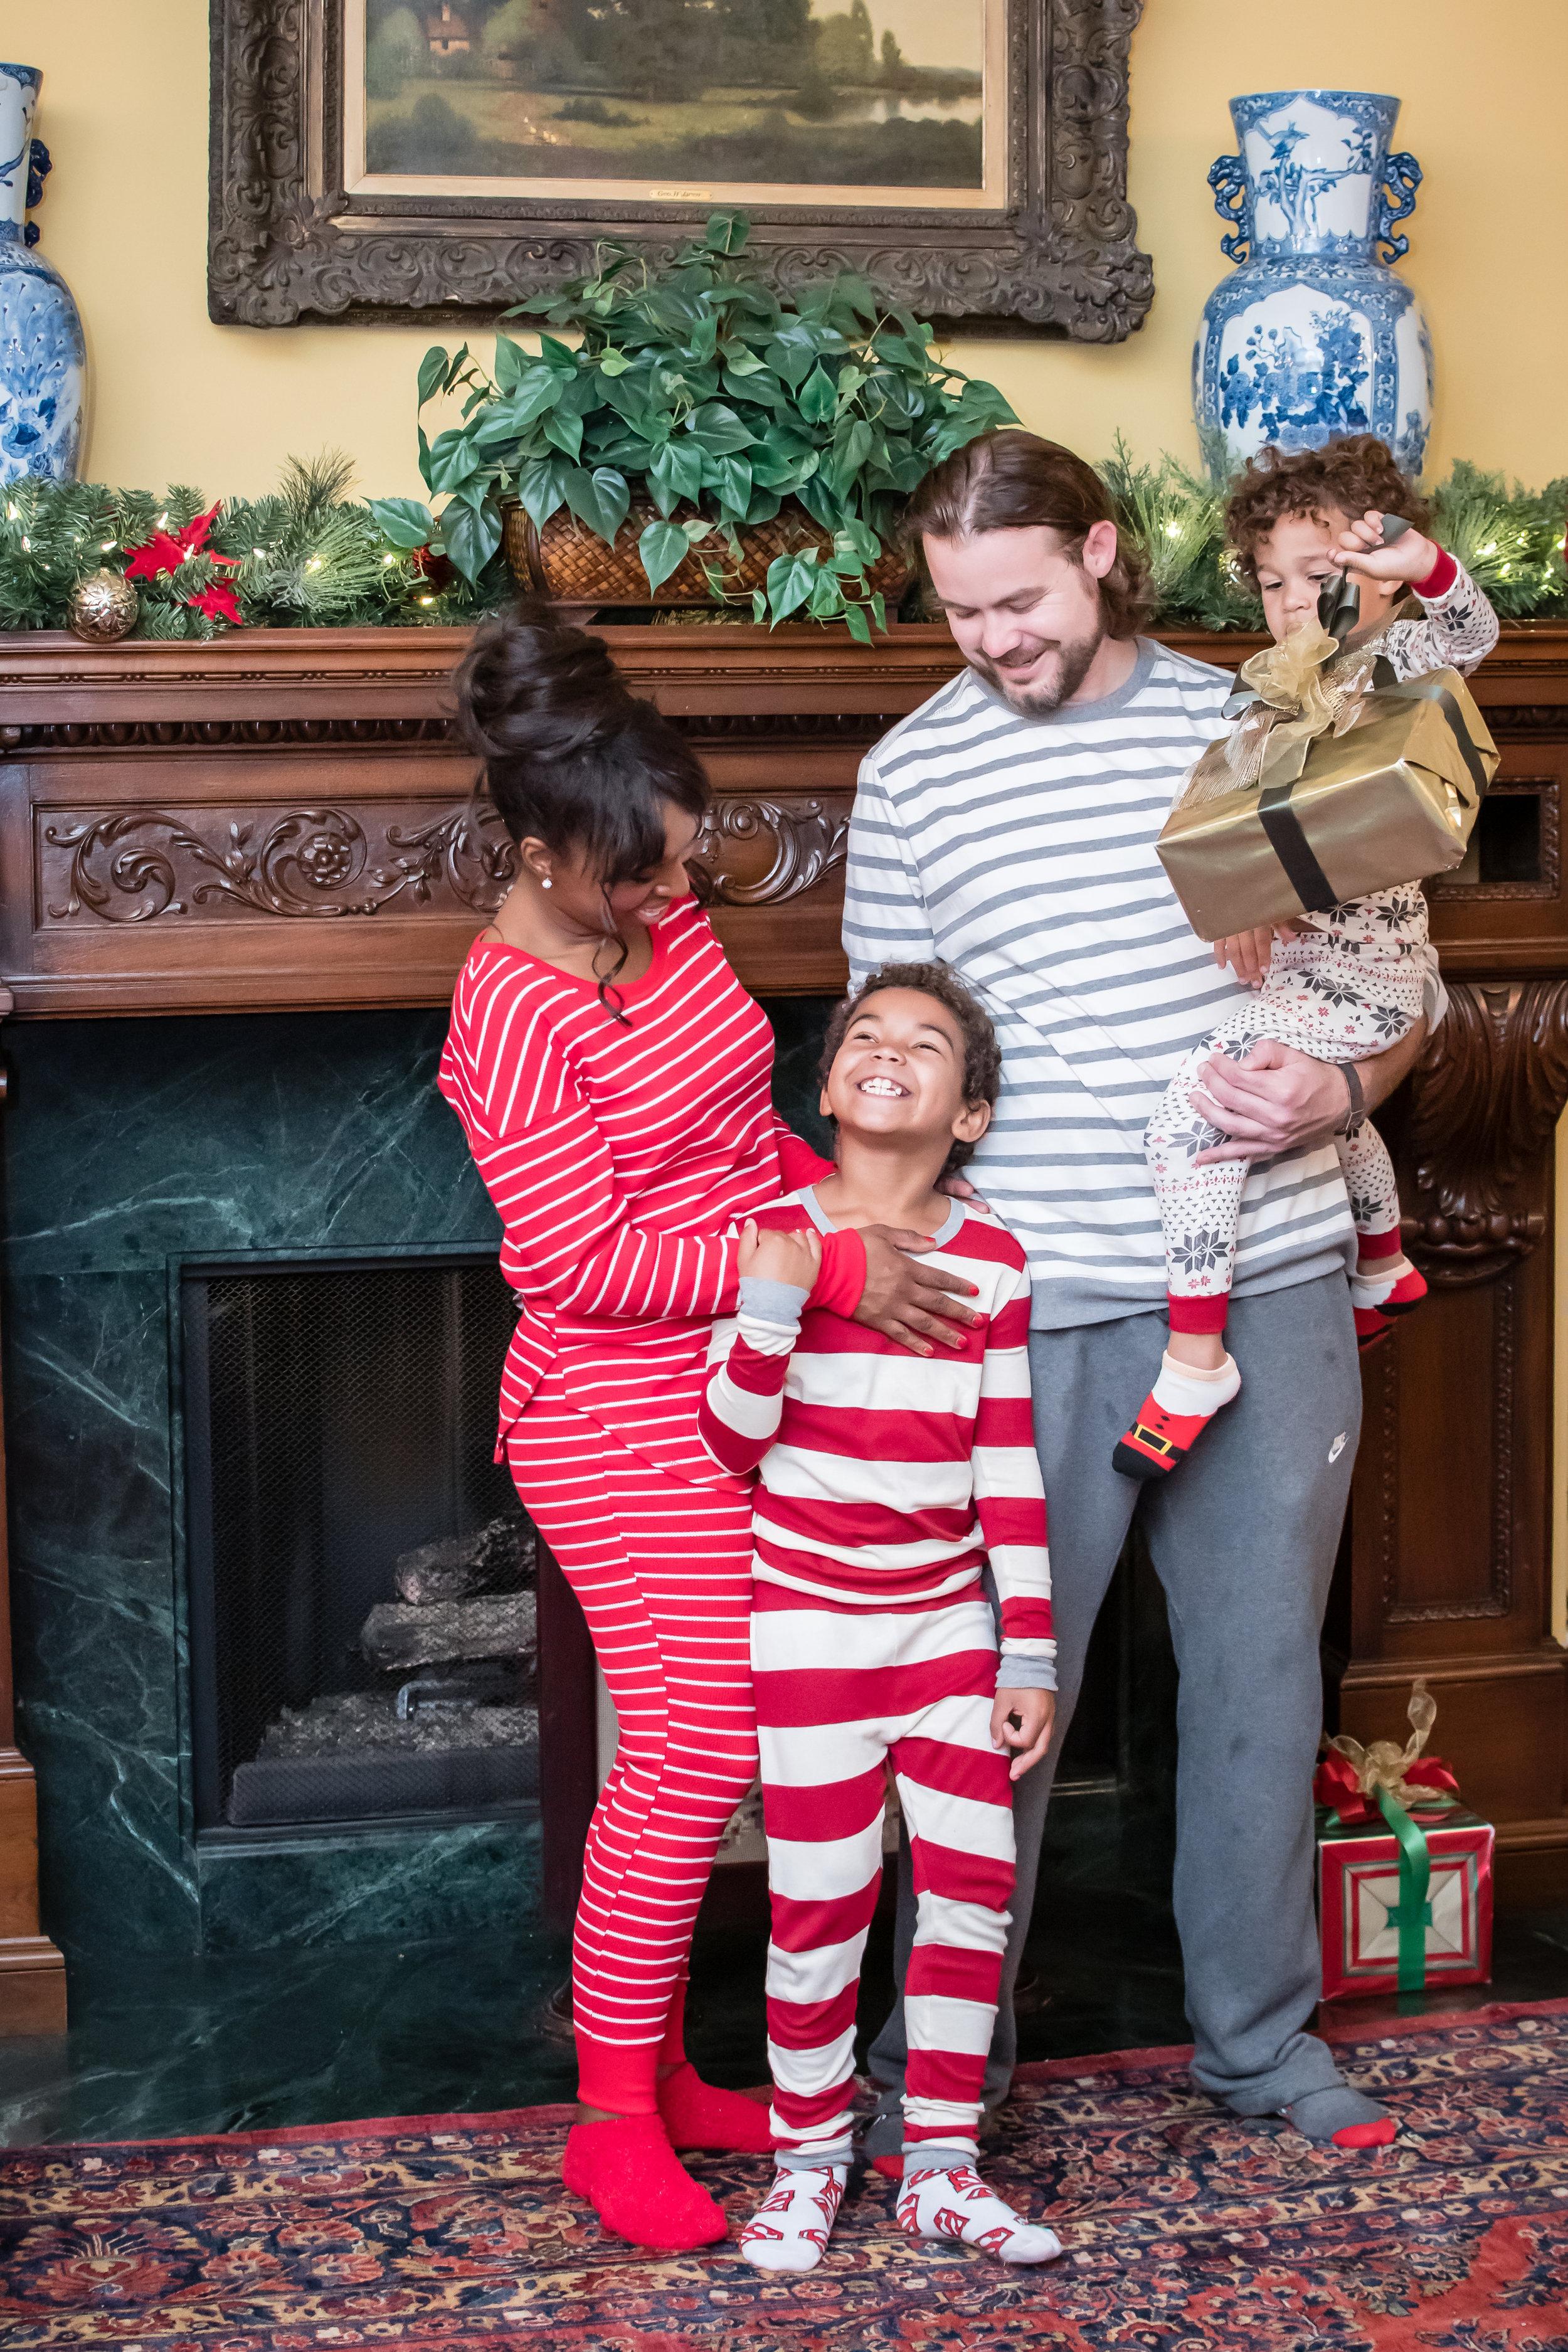 Christmas Day in pajamas photos by the chimney Orlando Photographer Yanitza Ninett